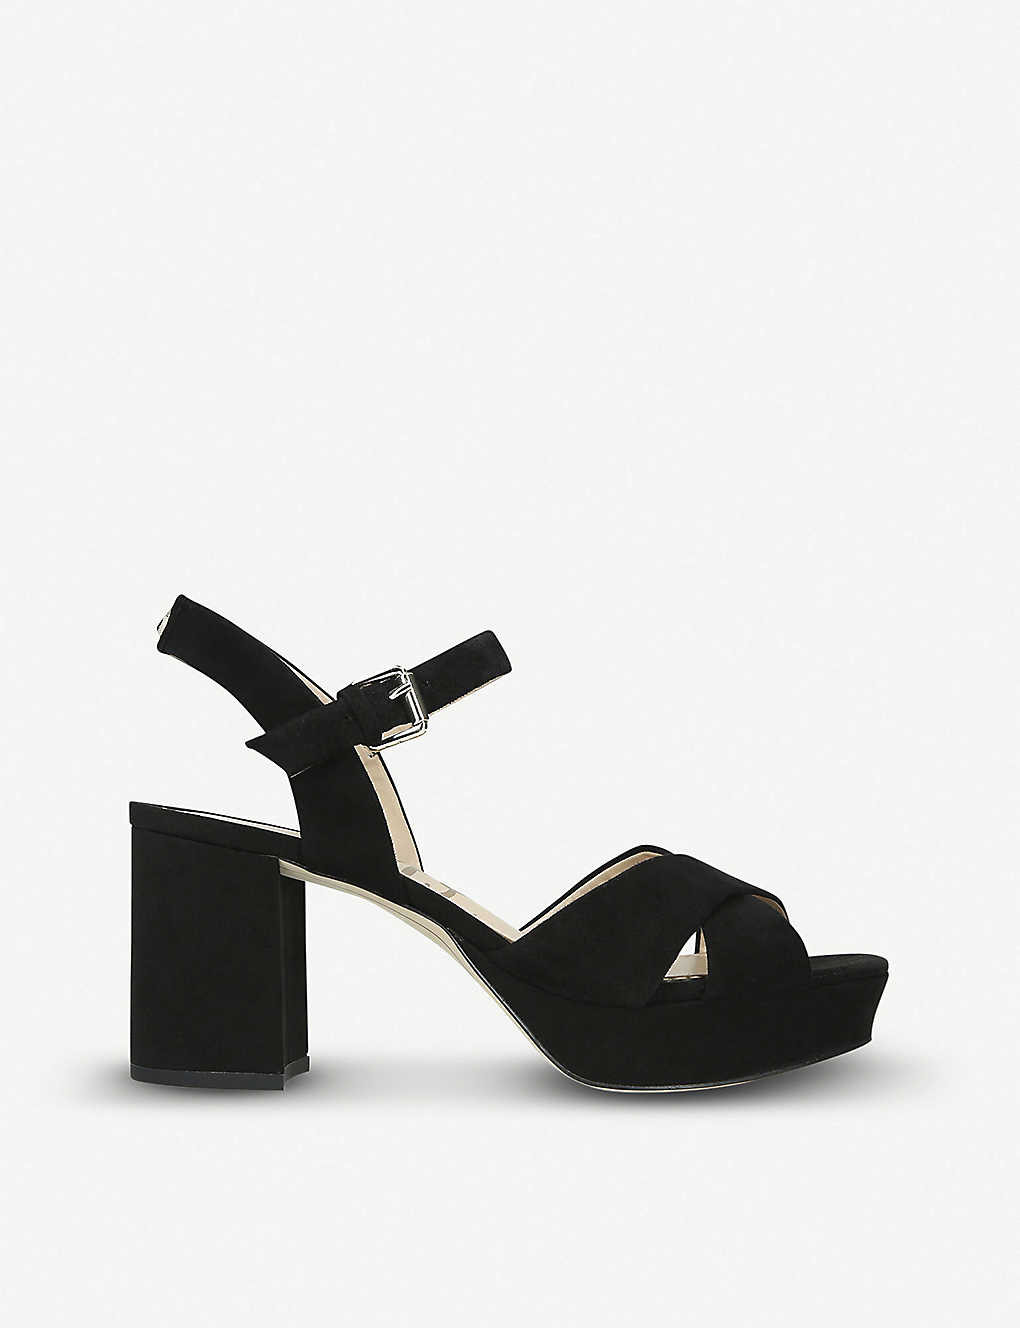 d11fa80a5c89 SAM EDELMAN - Jolene suede platform sandals